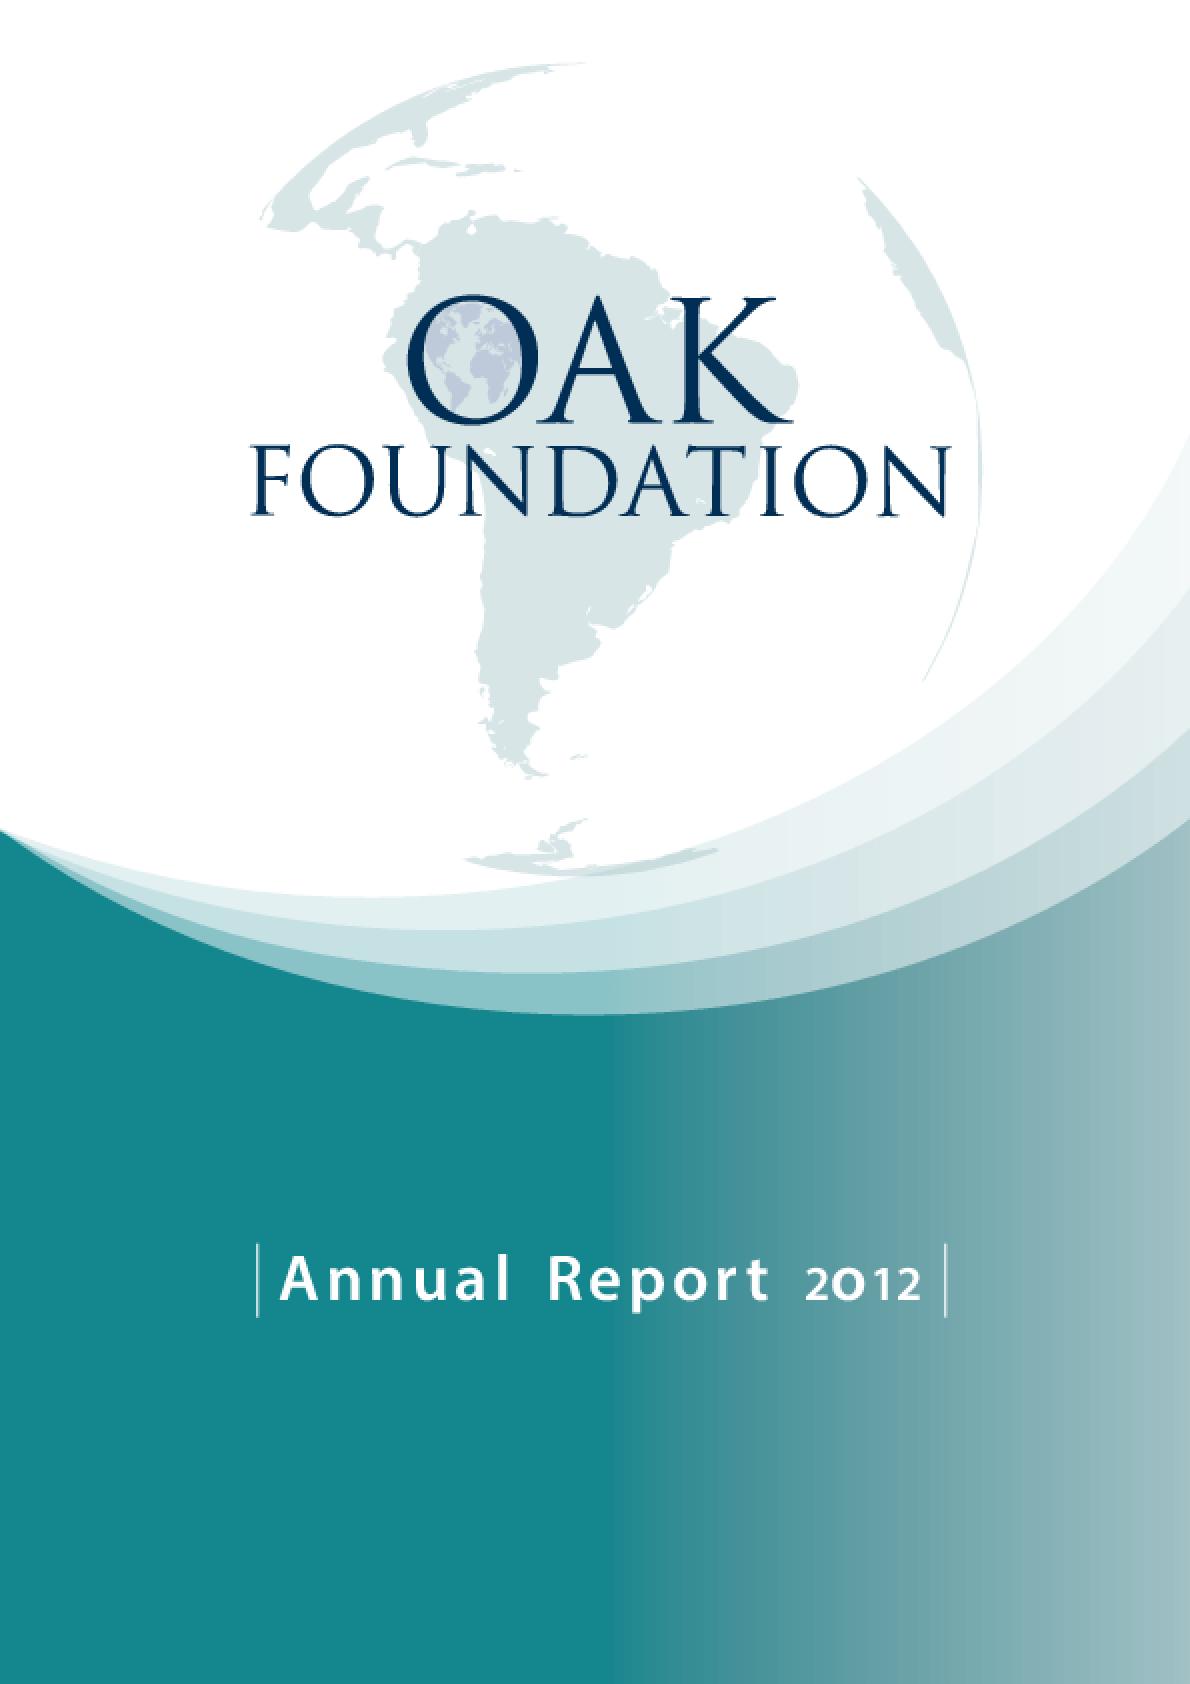 Oak Foundation Annual Report 2012